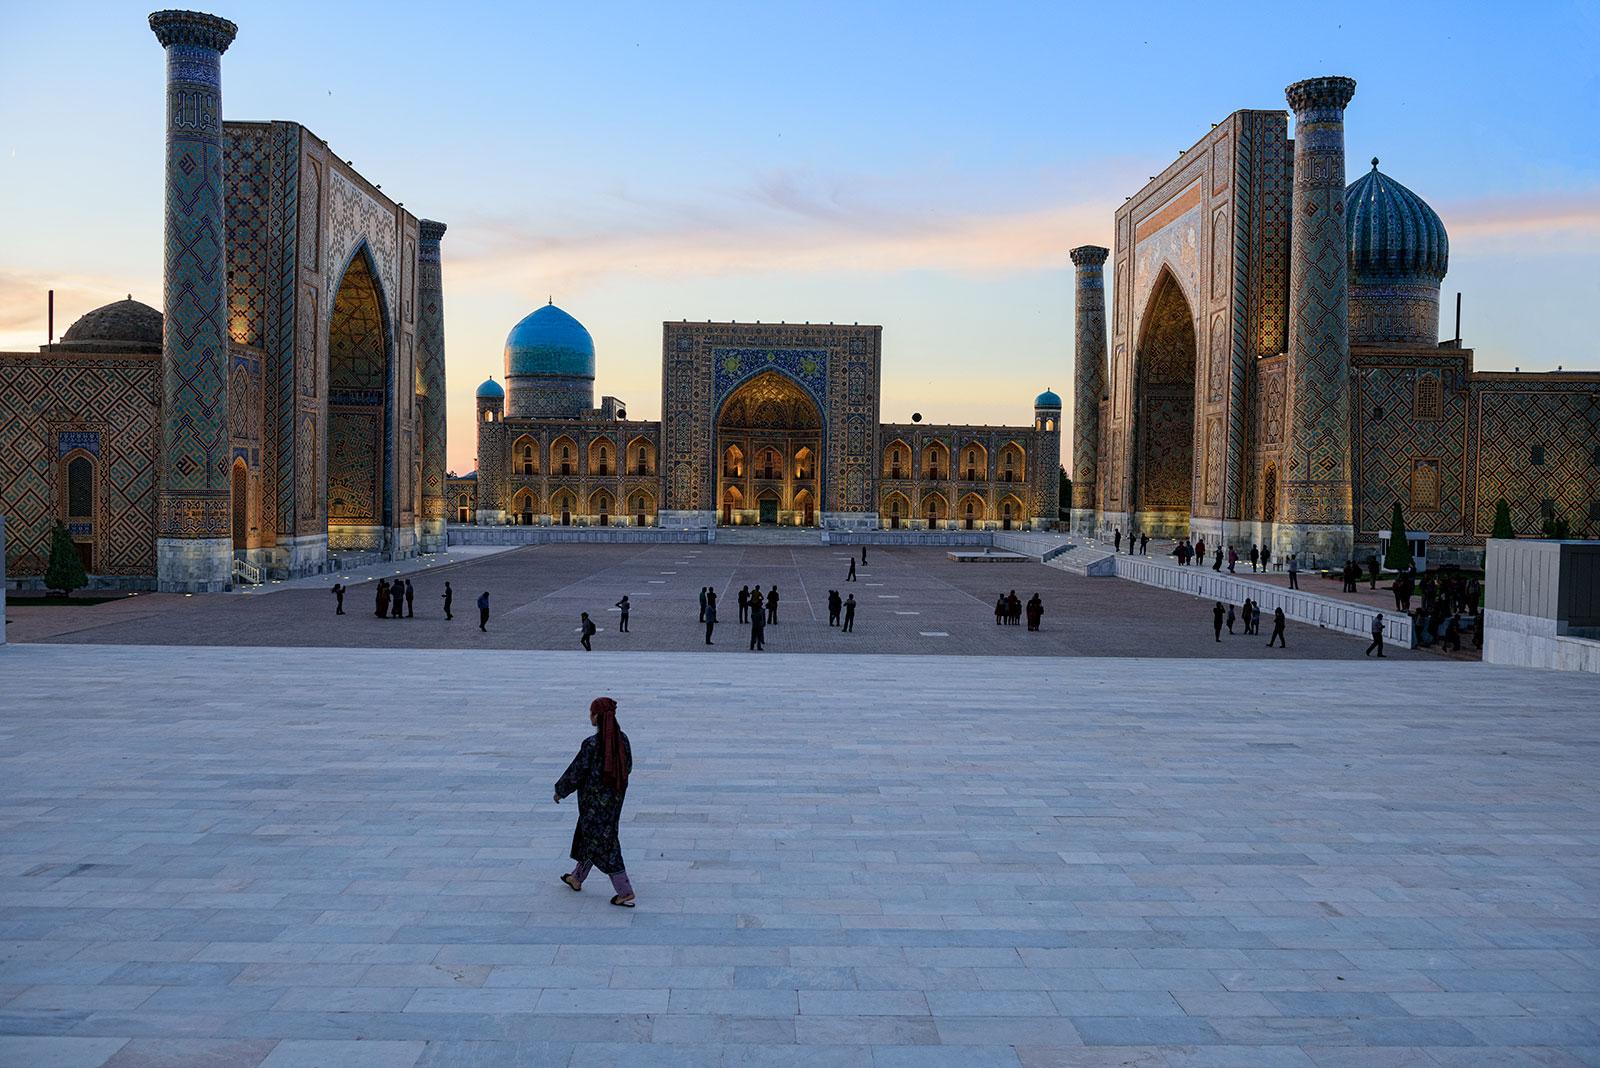 Vacheron-Constantin---Steve-McCurry---Samarkand-Uzbekistan---J4_1402270